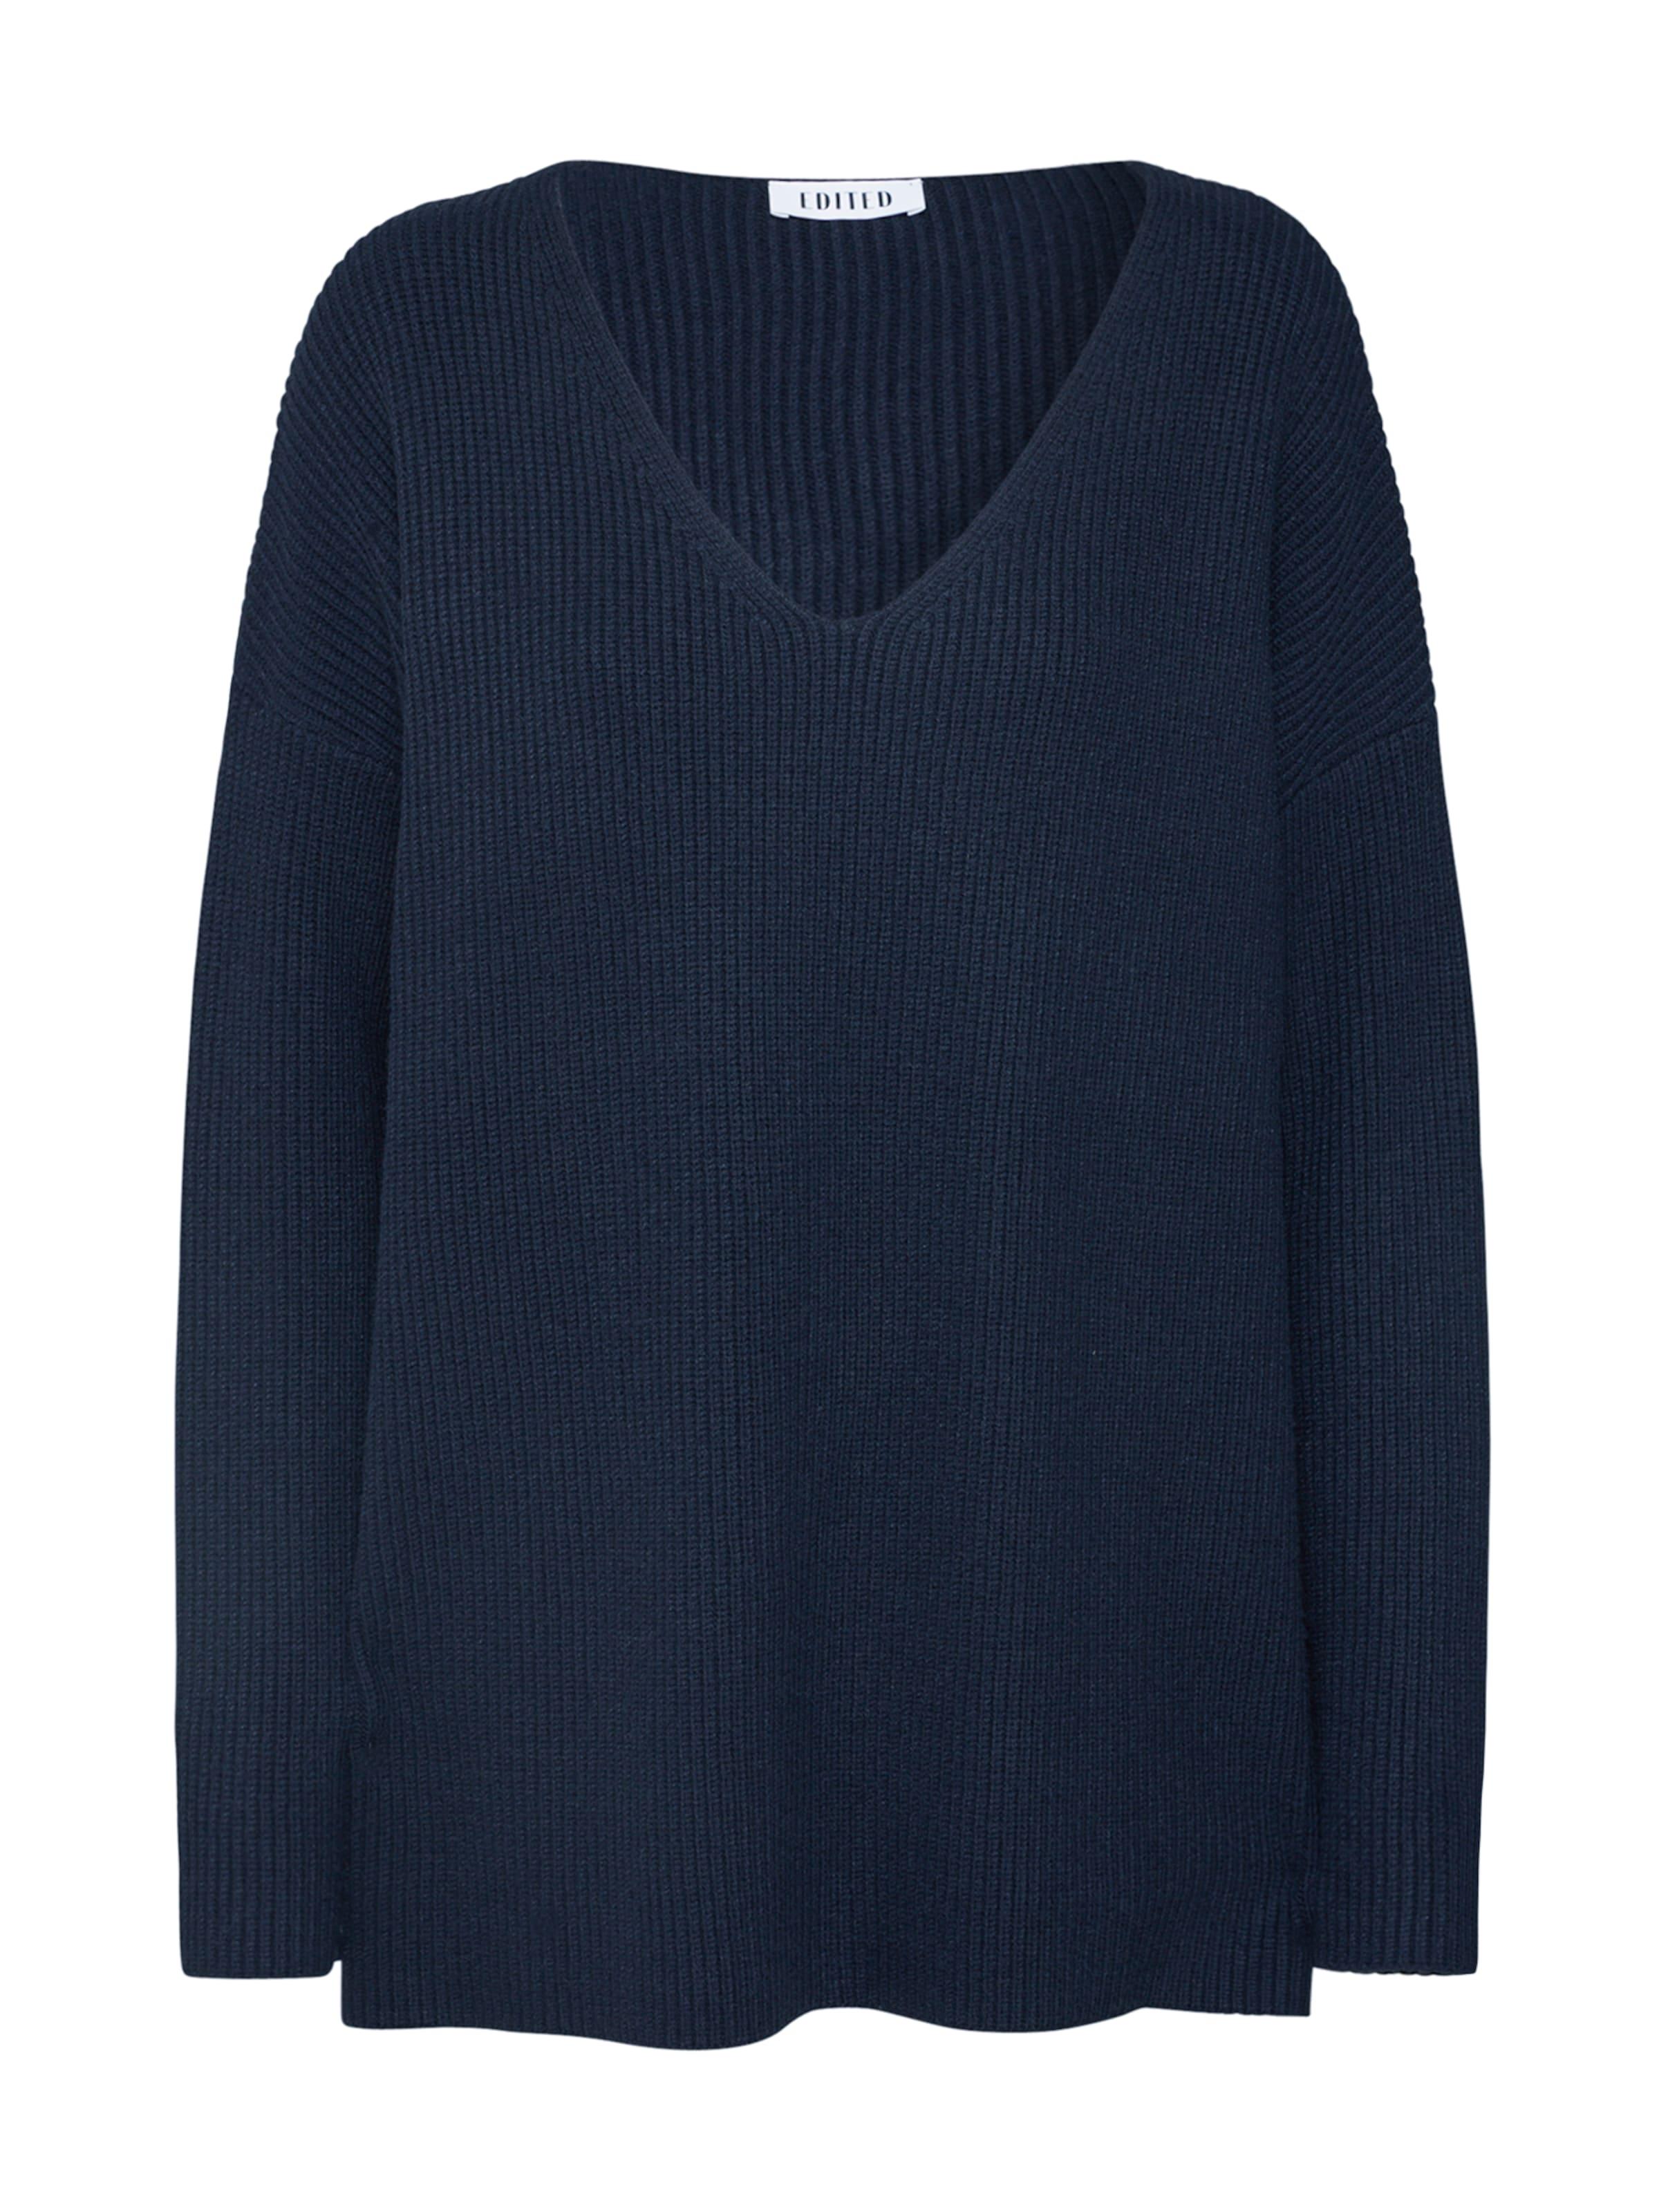 In Nachtblau Pullover Edited 'akira' BlauNavy PXkZiuOT